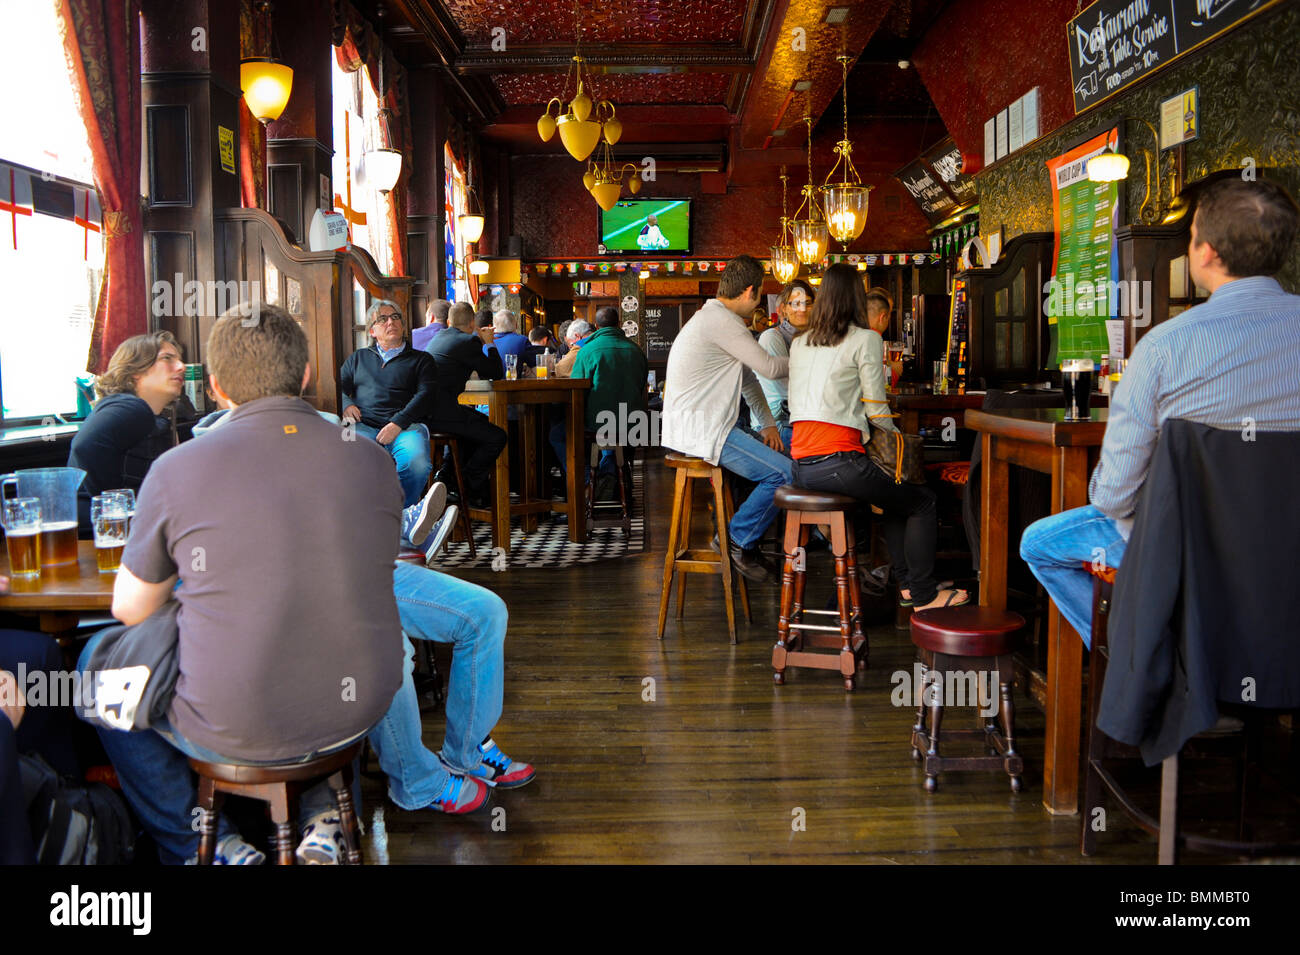 Old British Pubs, Bars, London, England, UK, crowd